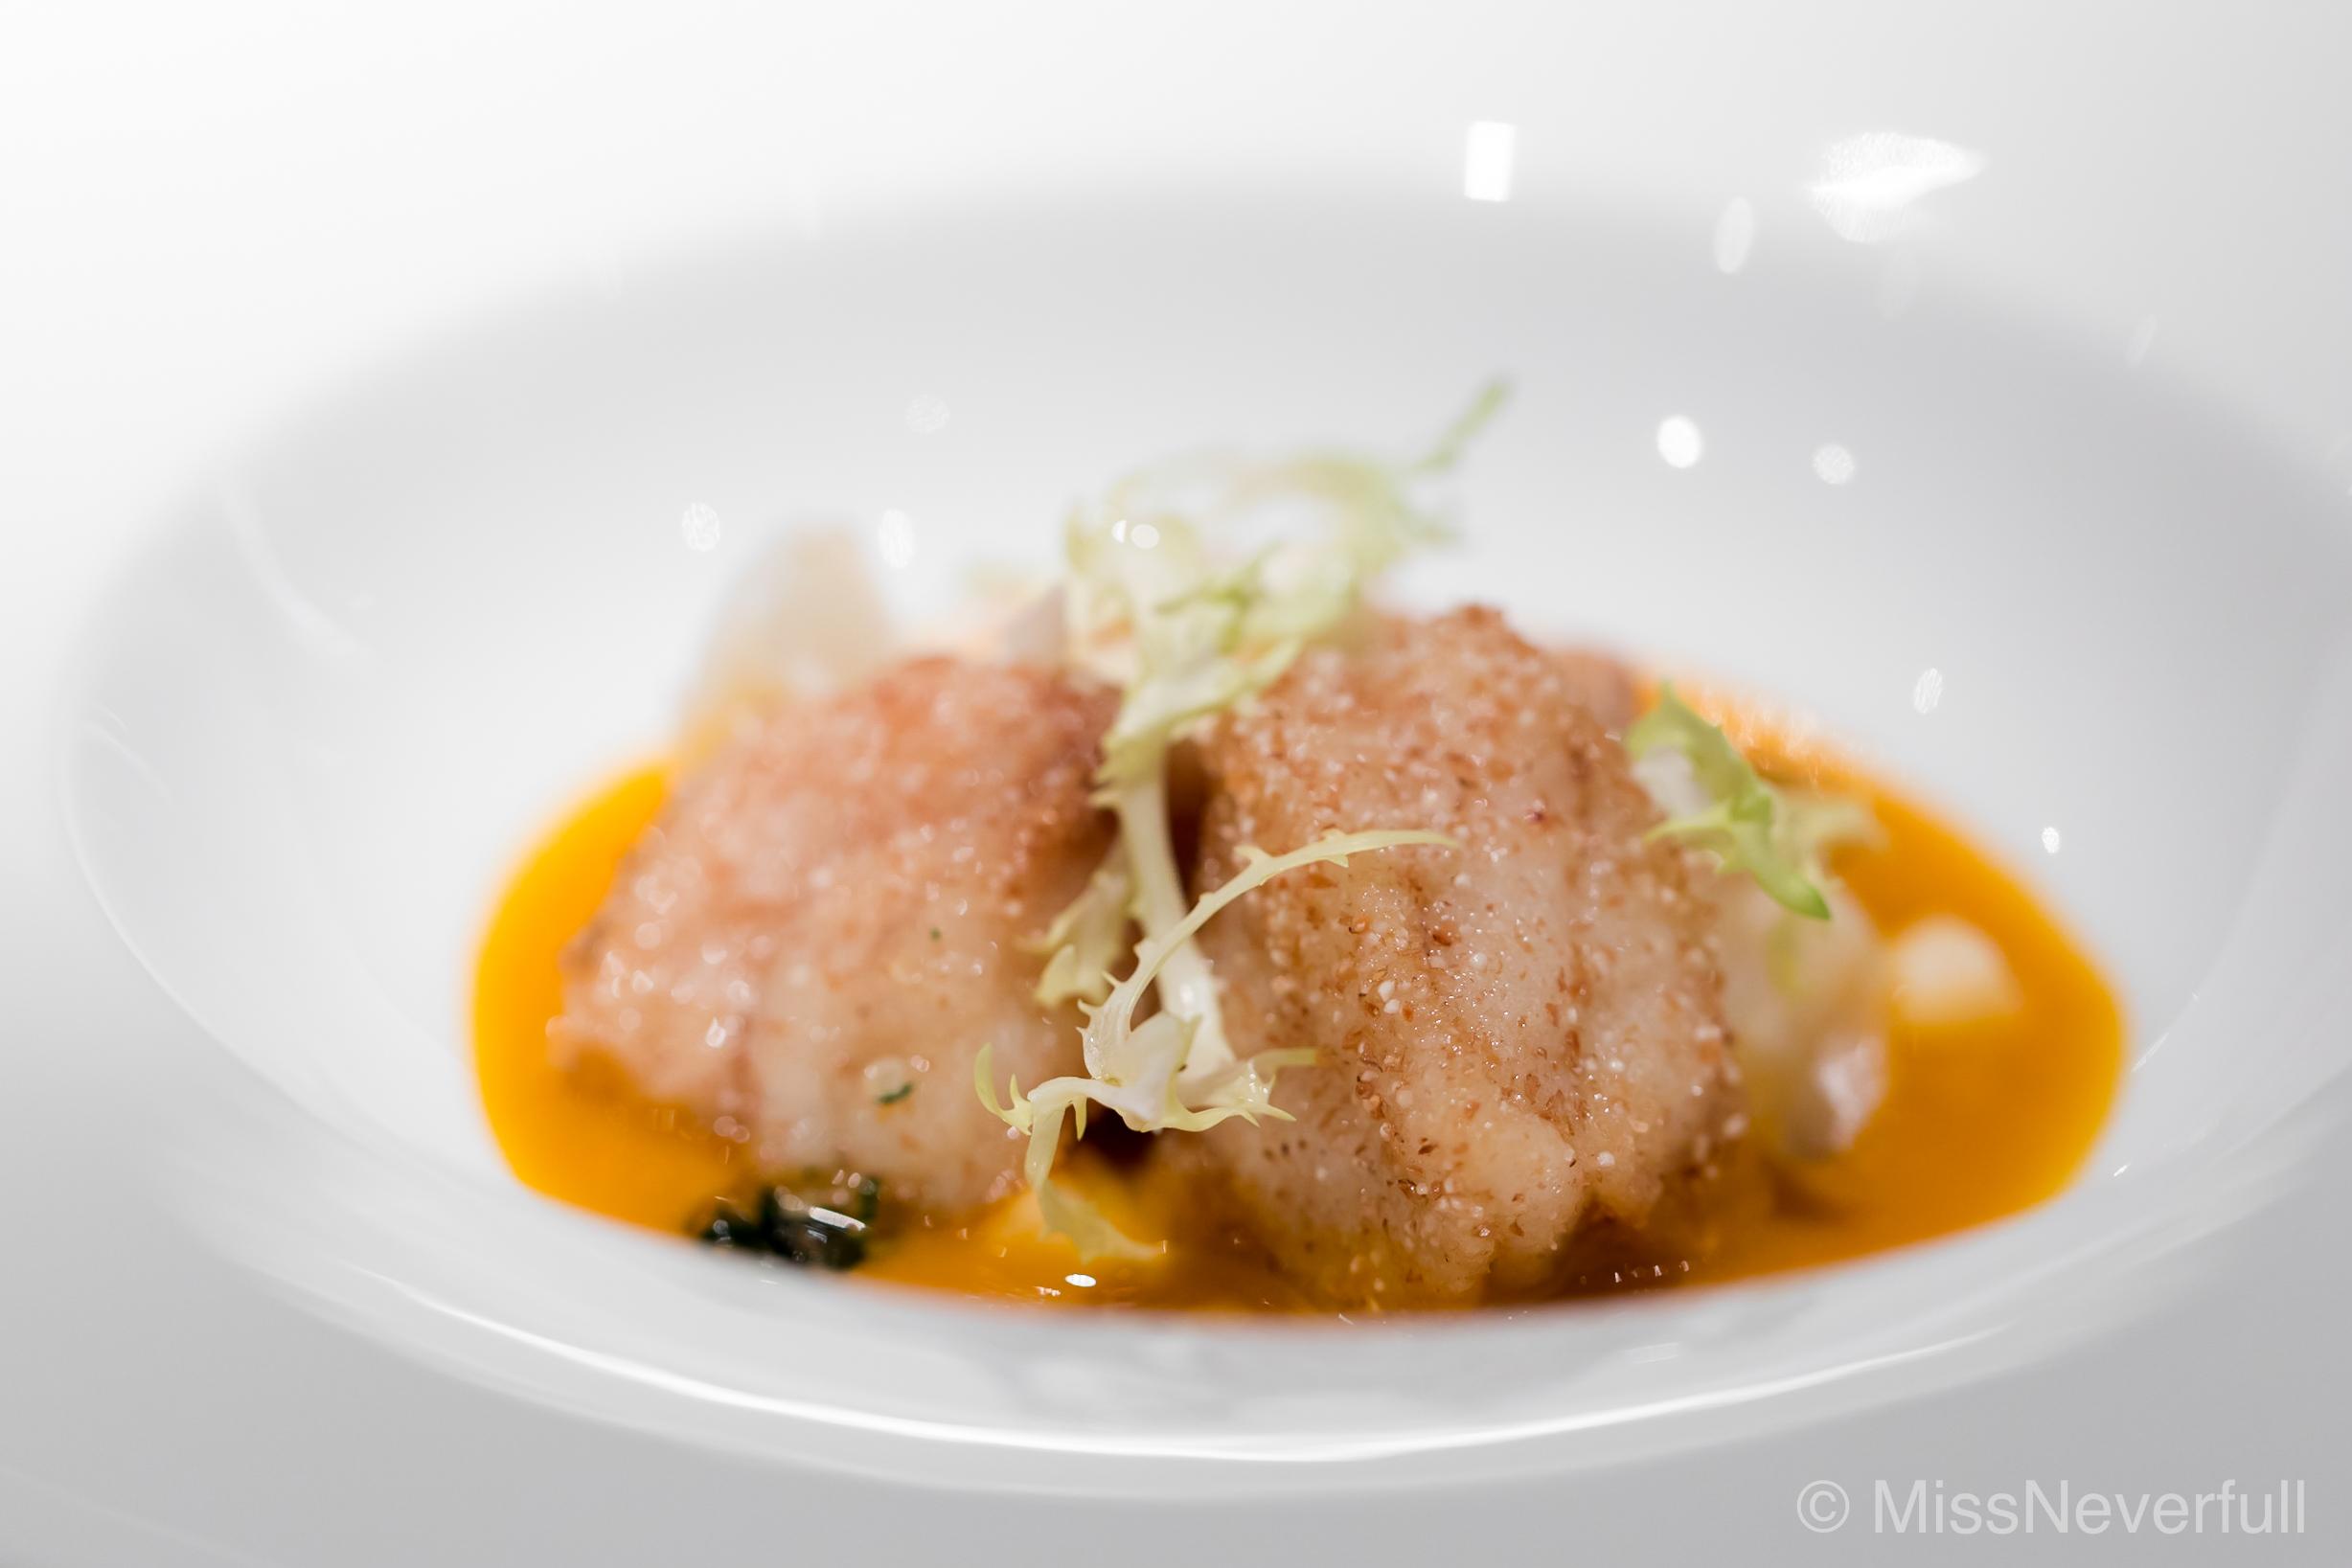 4. Deep-fried Ankimo (monkfish) & lily bulb